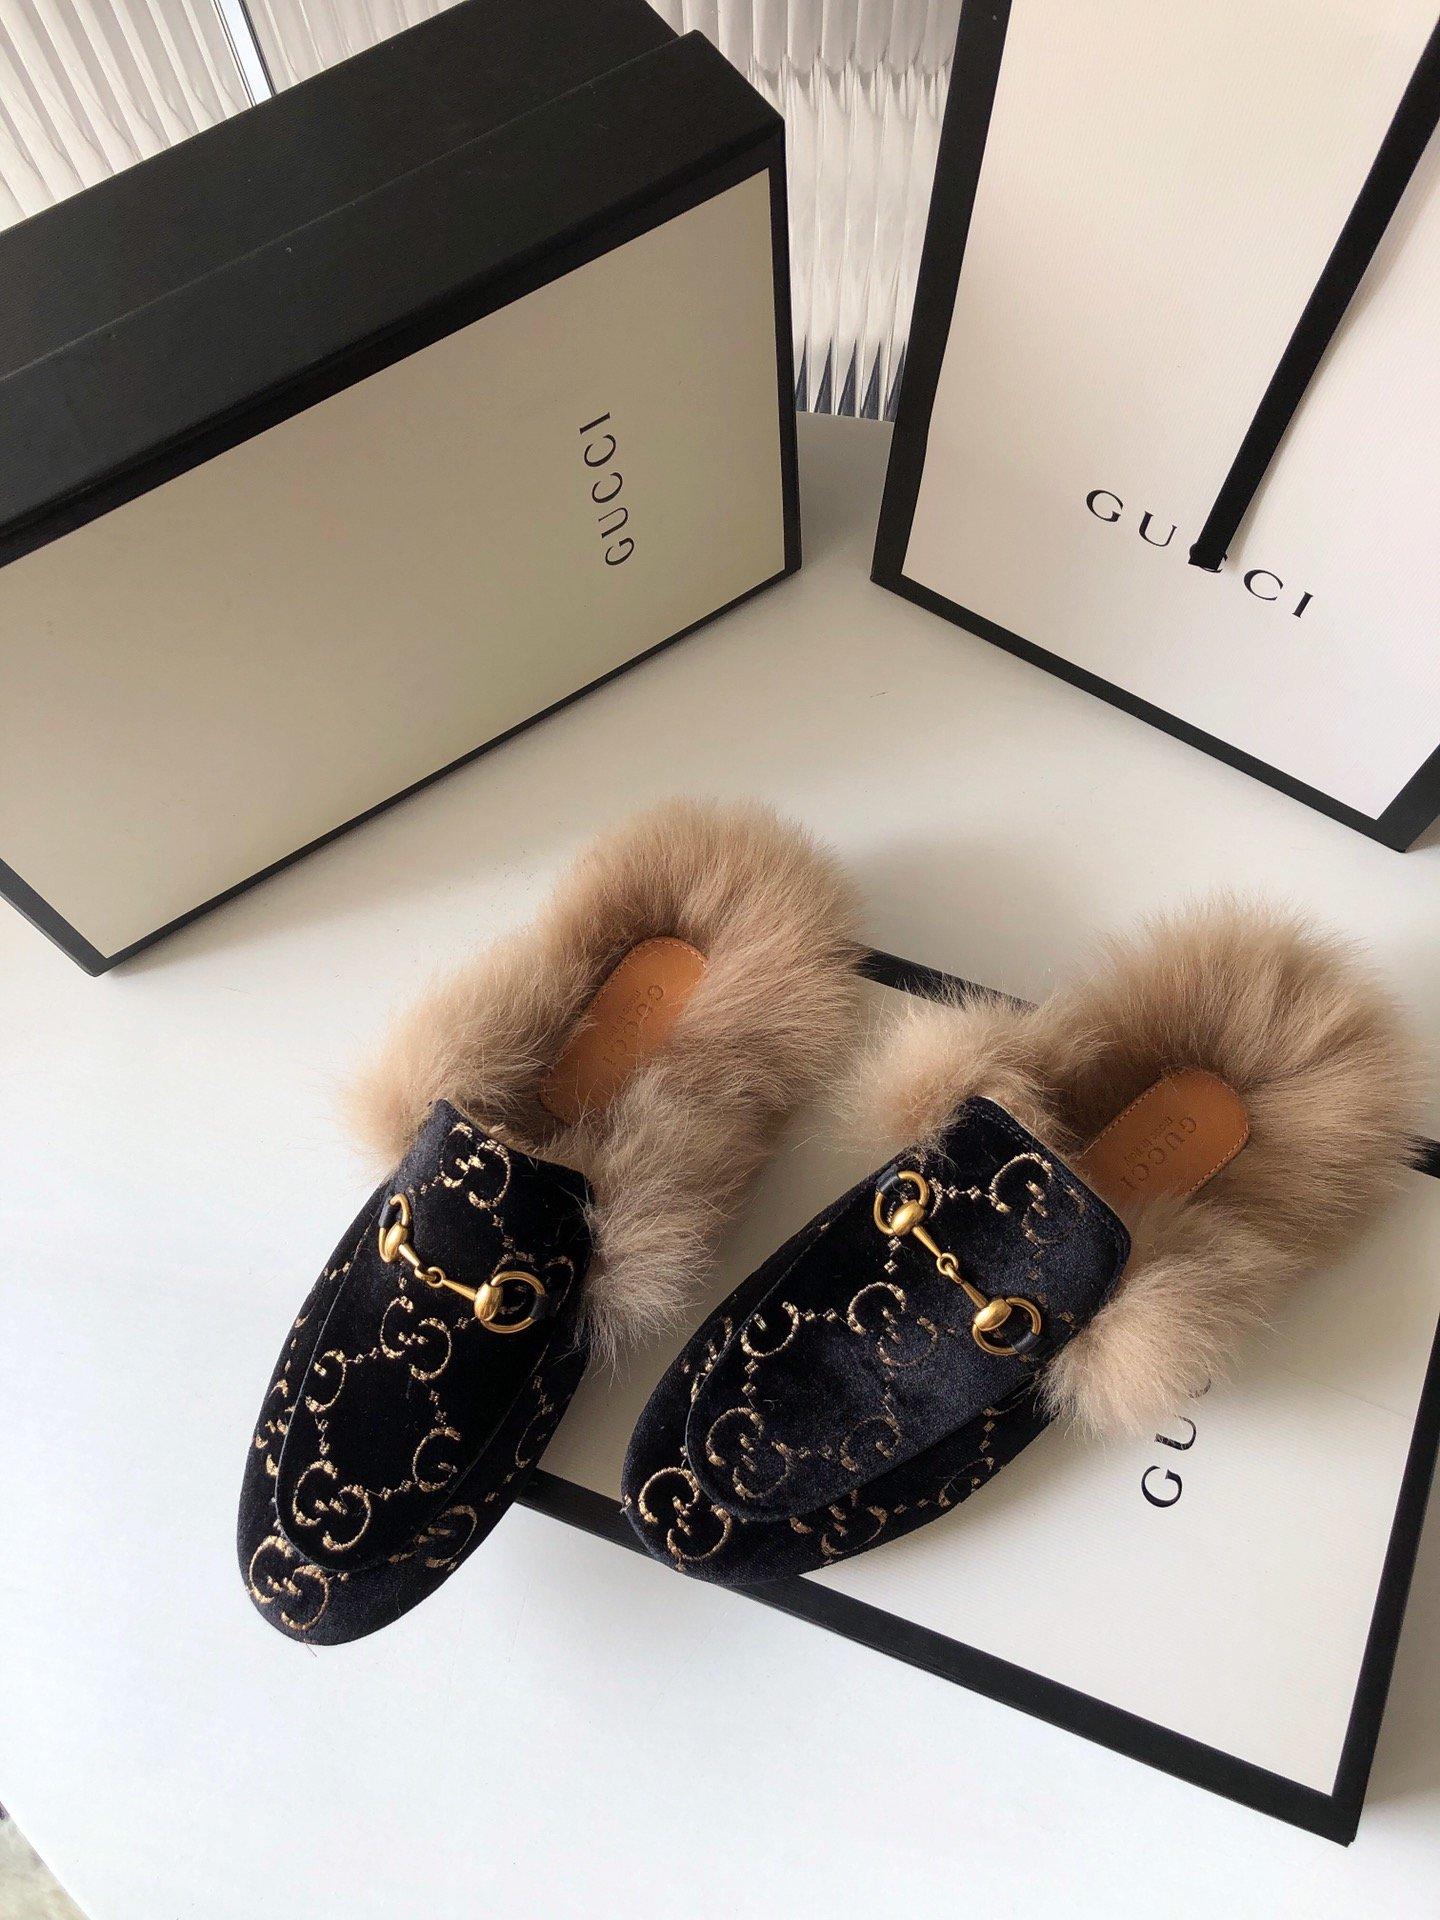 Gucci古奇 羔羊毛穆勒鞋双GG绣明星同款(图6)